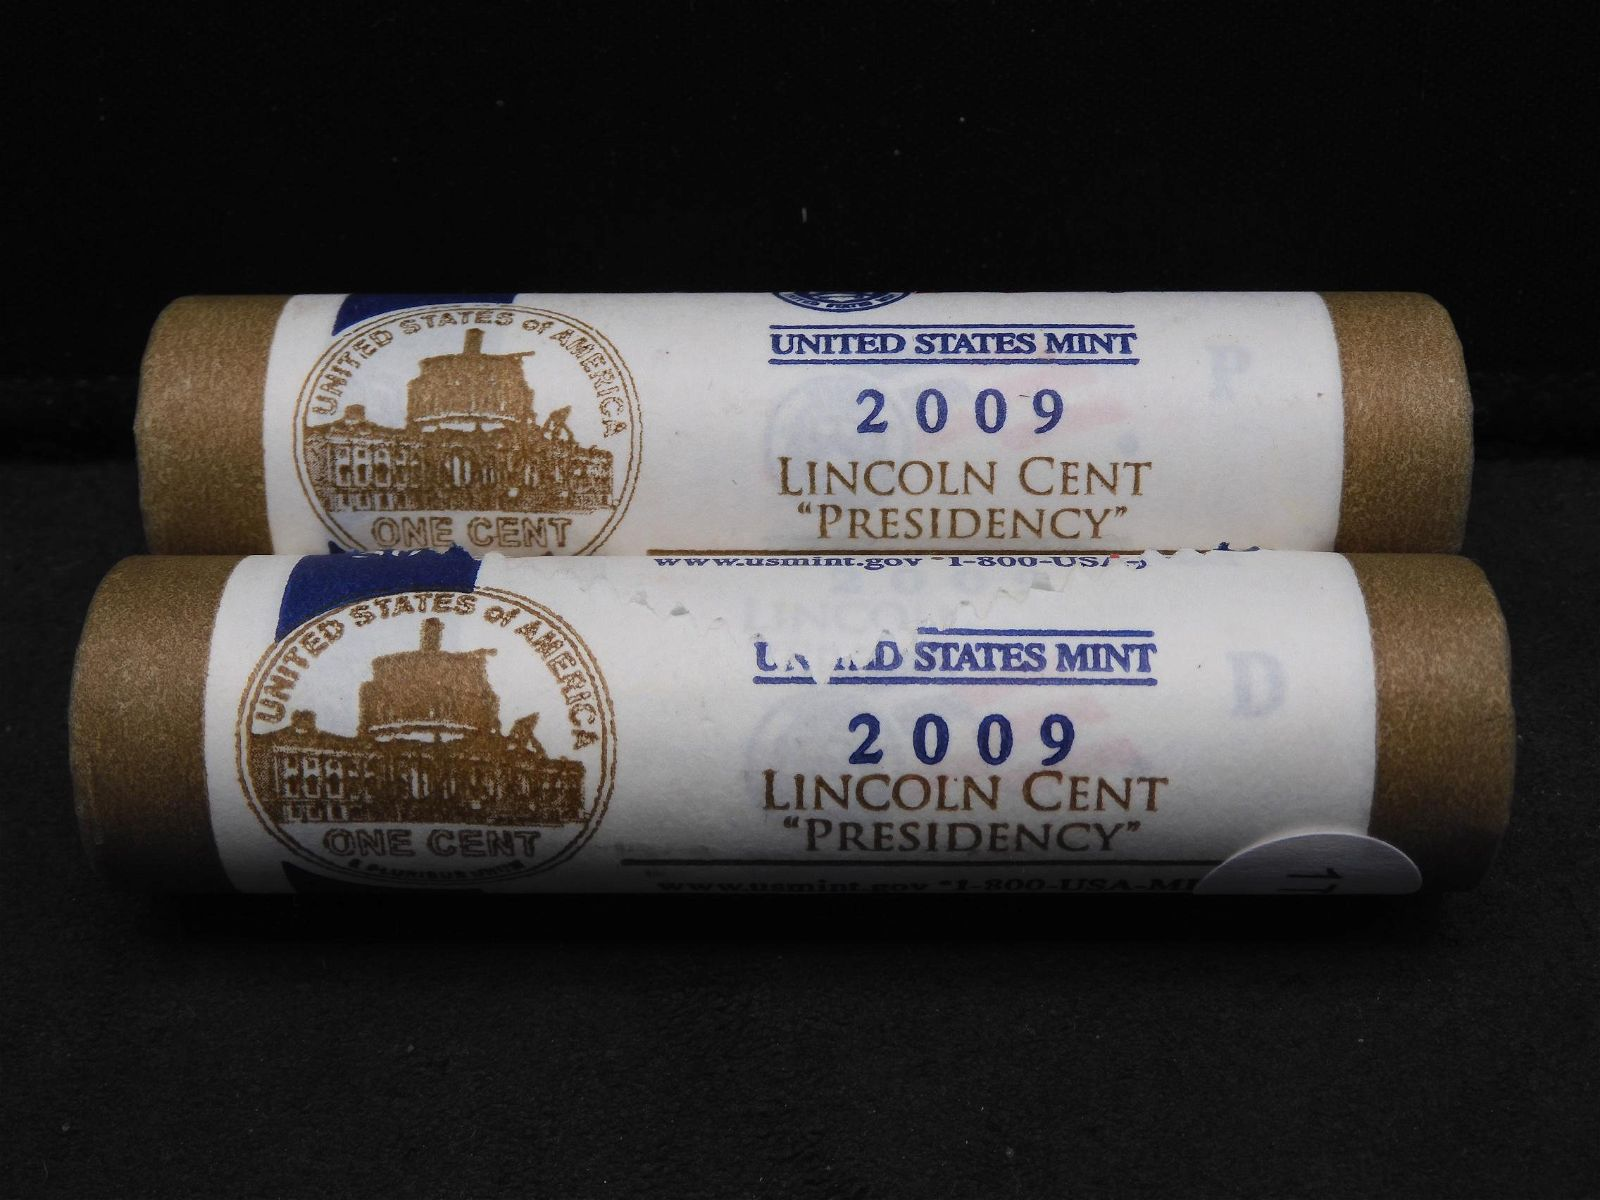 2009 P & D Lincoln Cent Presidency US Mint Fancy